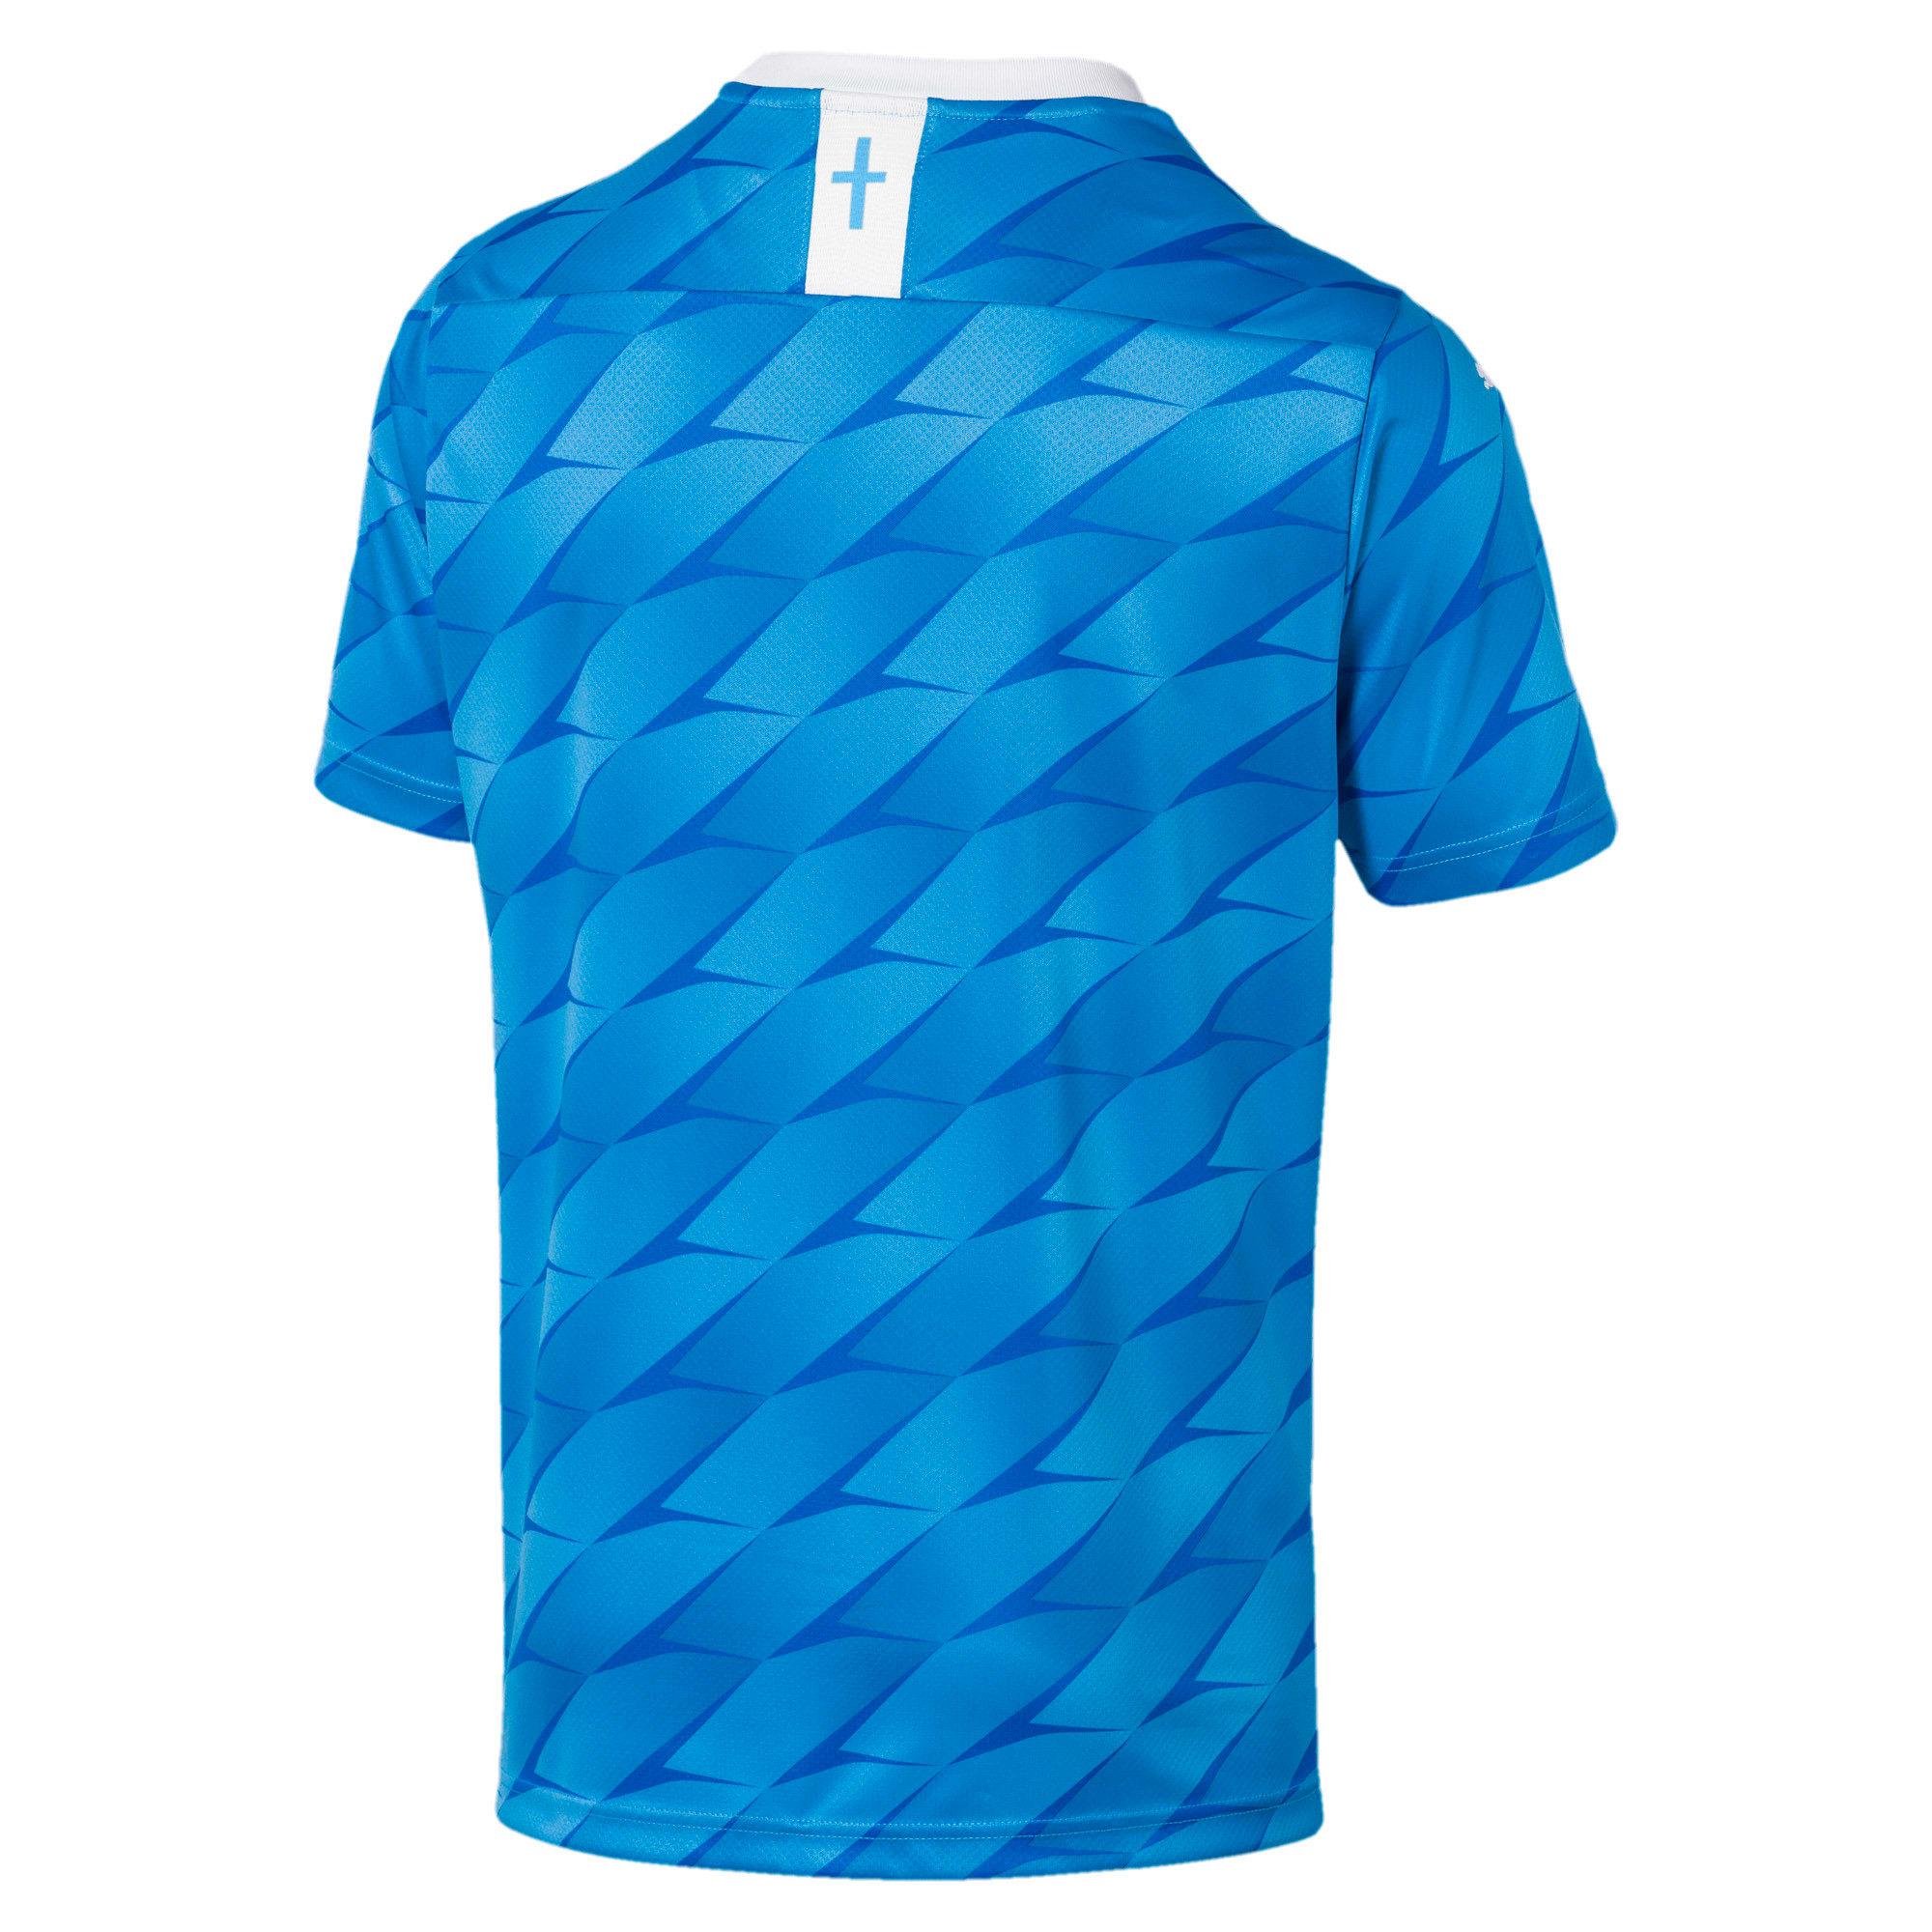 Thumbnail 2 of Olympique de Marseille Men's Away Replica Jersey, Bleu Azur-Puma White, medium